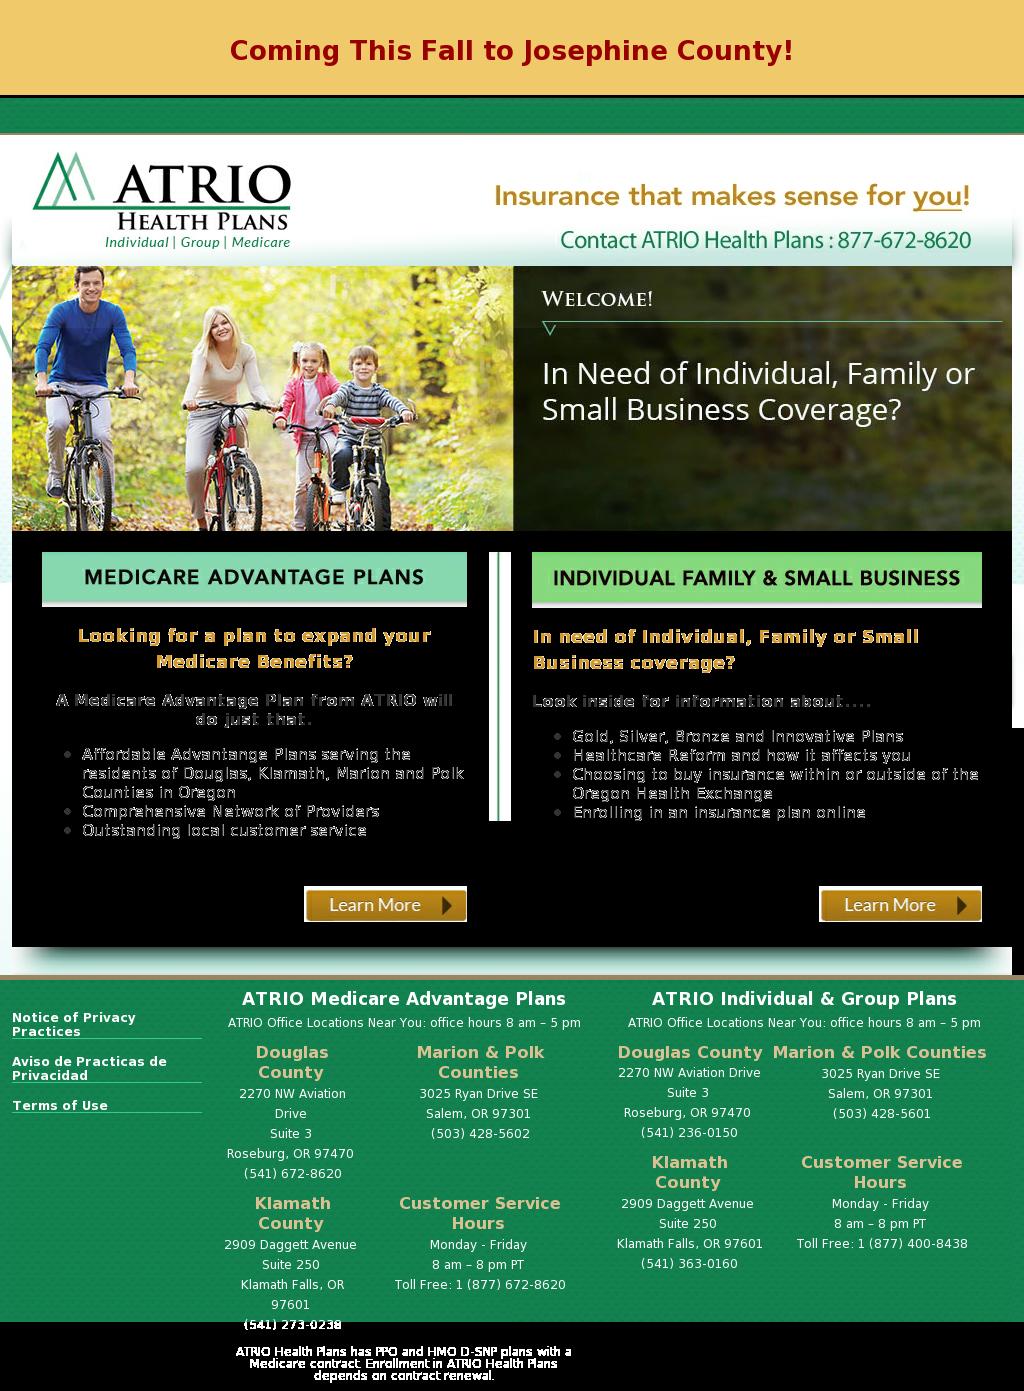 ATRIO Competitors, Revenue and Employees - Owler Company Profile